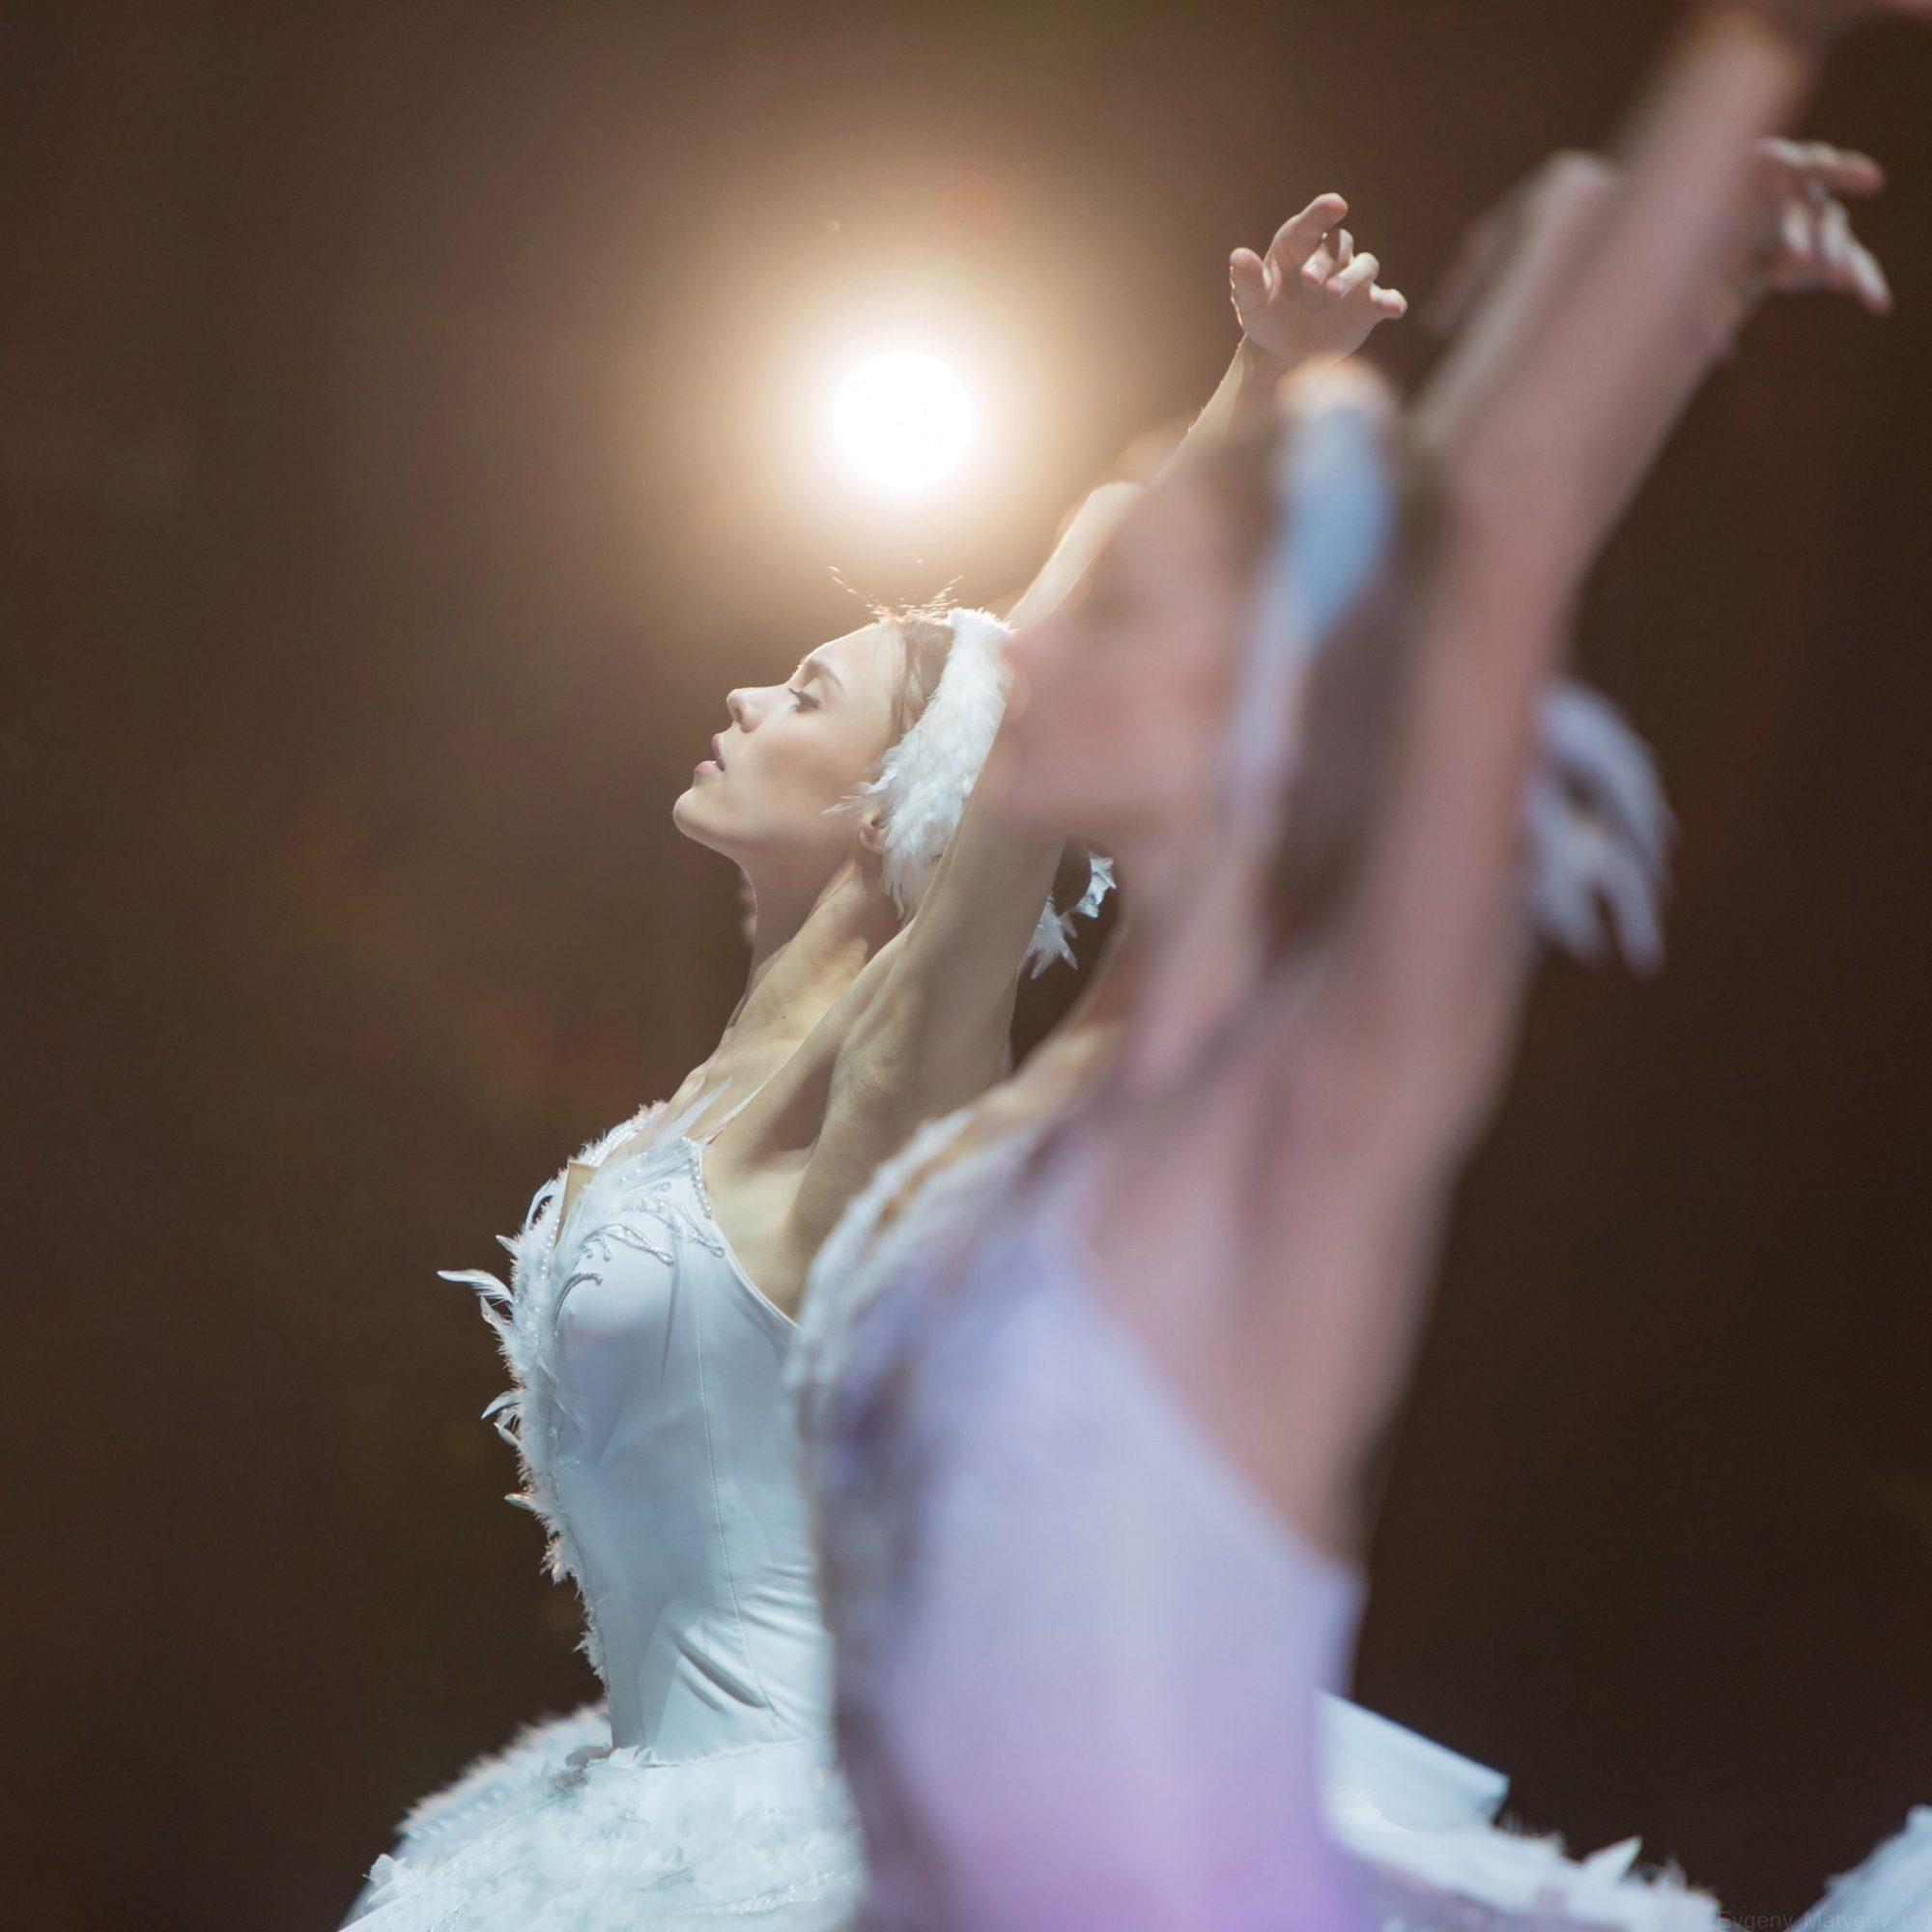 ballet_01_017-2000x2000.jpg